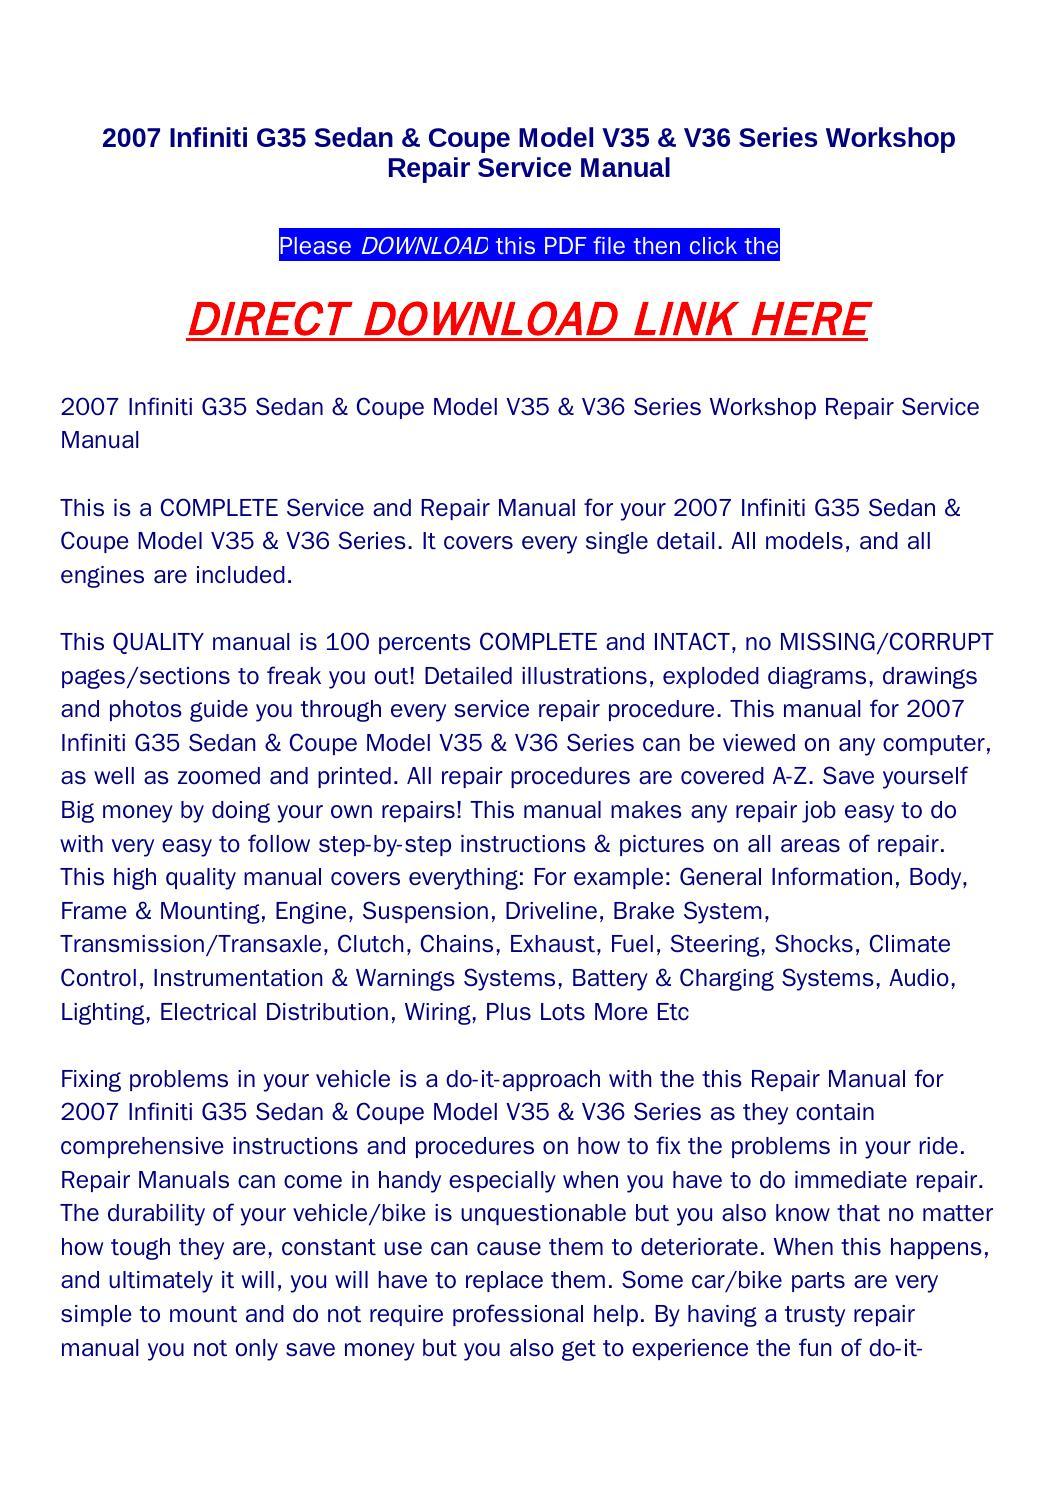 2007 infiniti g35 sedan & coupe model v35 & v36 series workshop repair  service manual by returnqqv - issuu